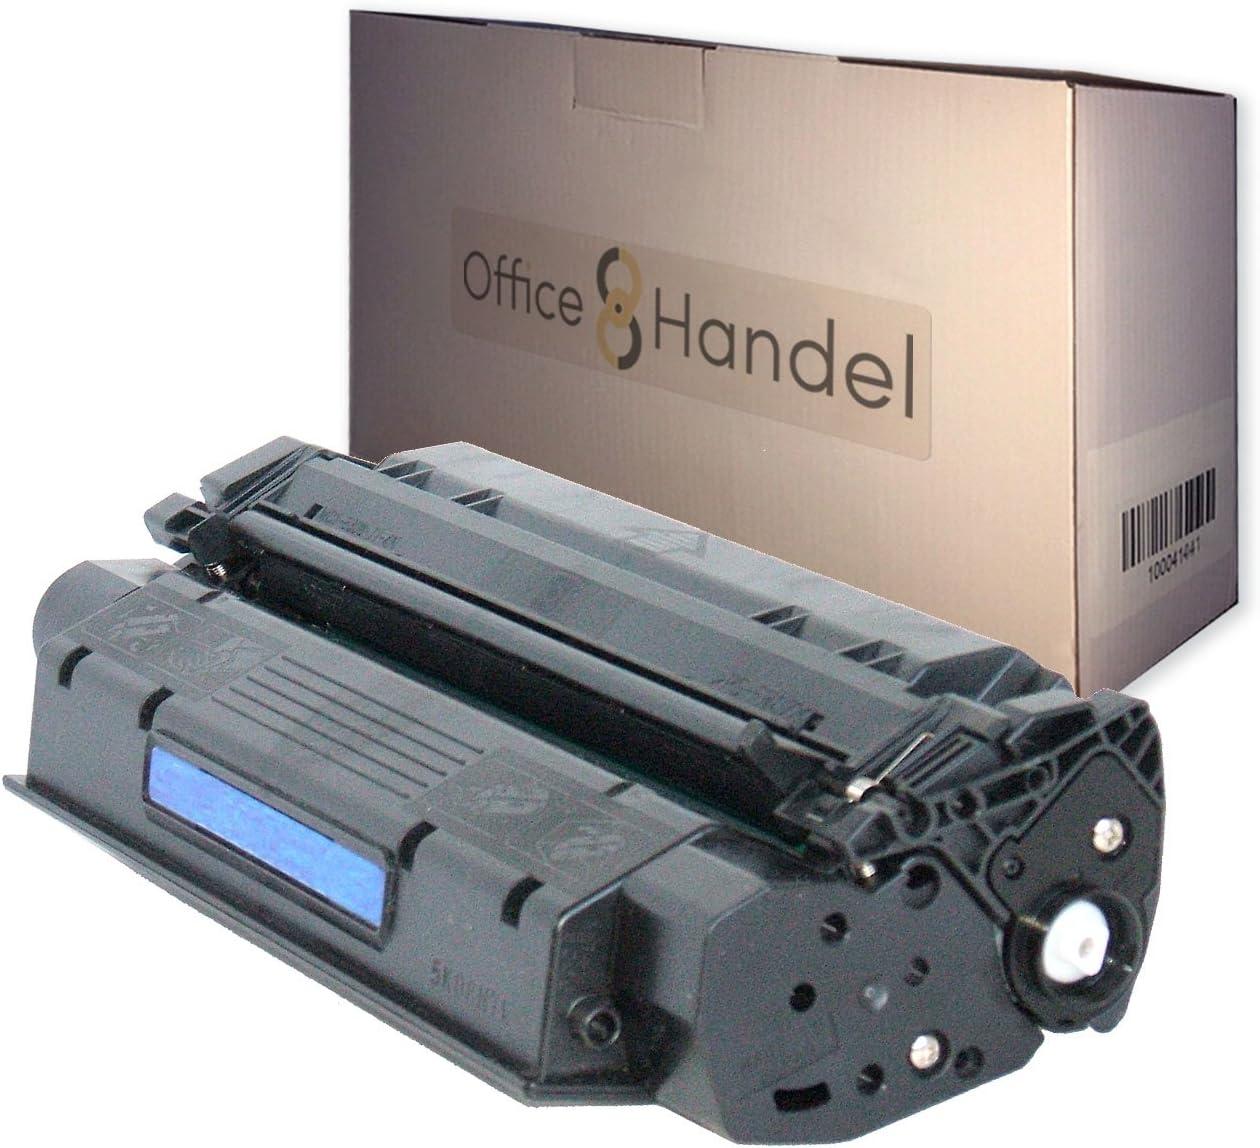 Toner für Canon Lasershot LBP-3240 Laserbase MF-5750 MF-3220 MF-5650 MF-5770